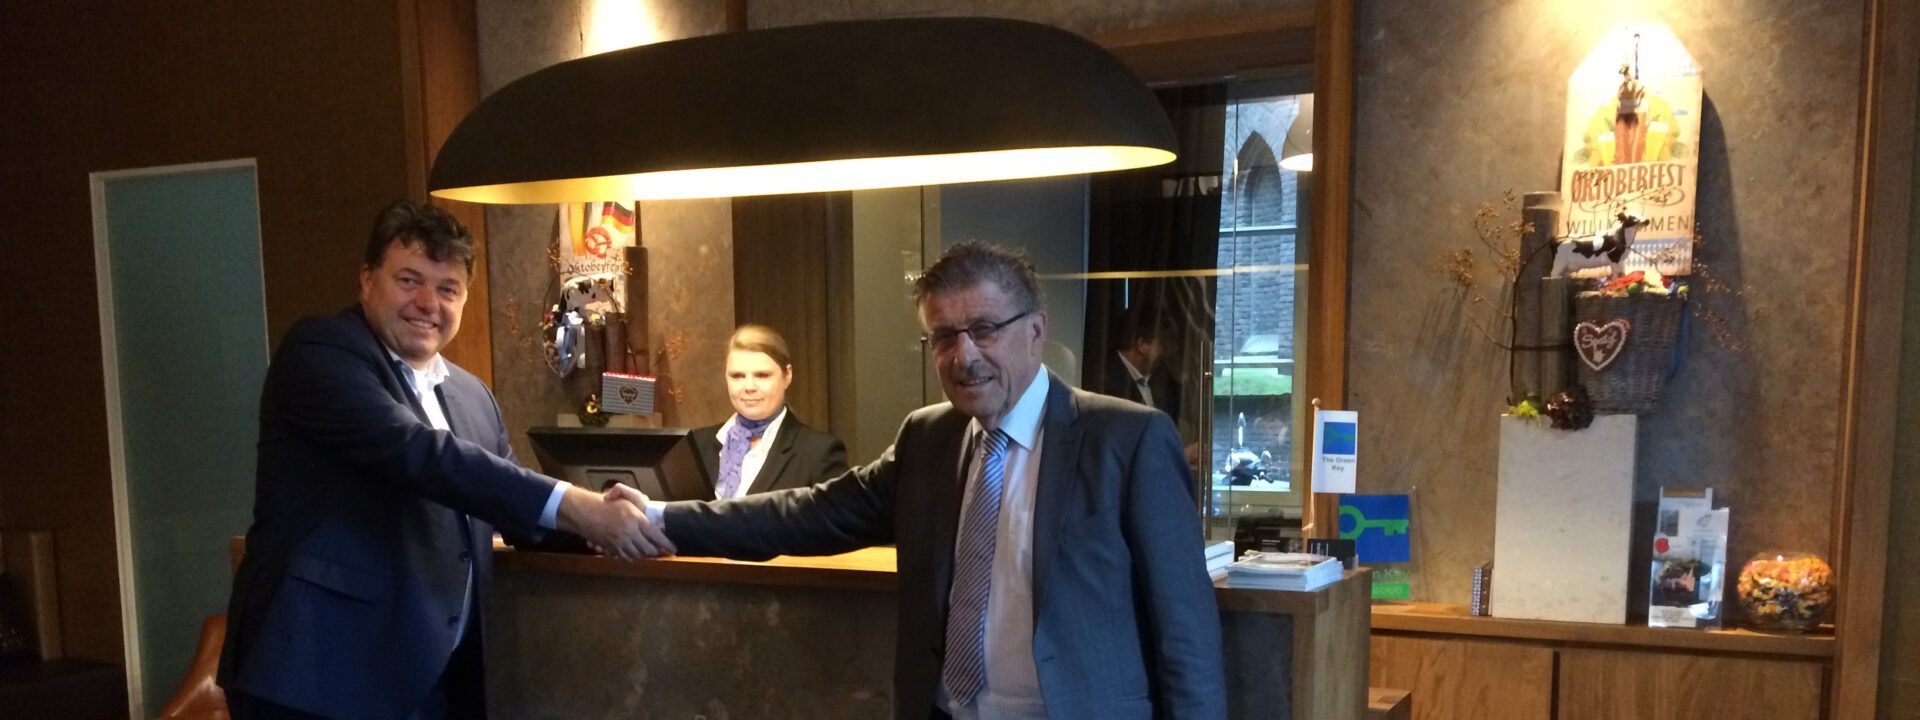 Hotel MERICI en EW Facility Services zetten gastbeleving centraal